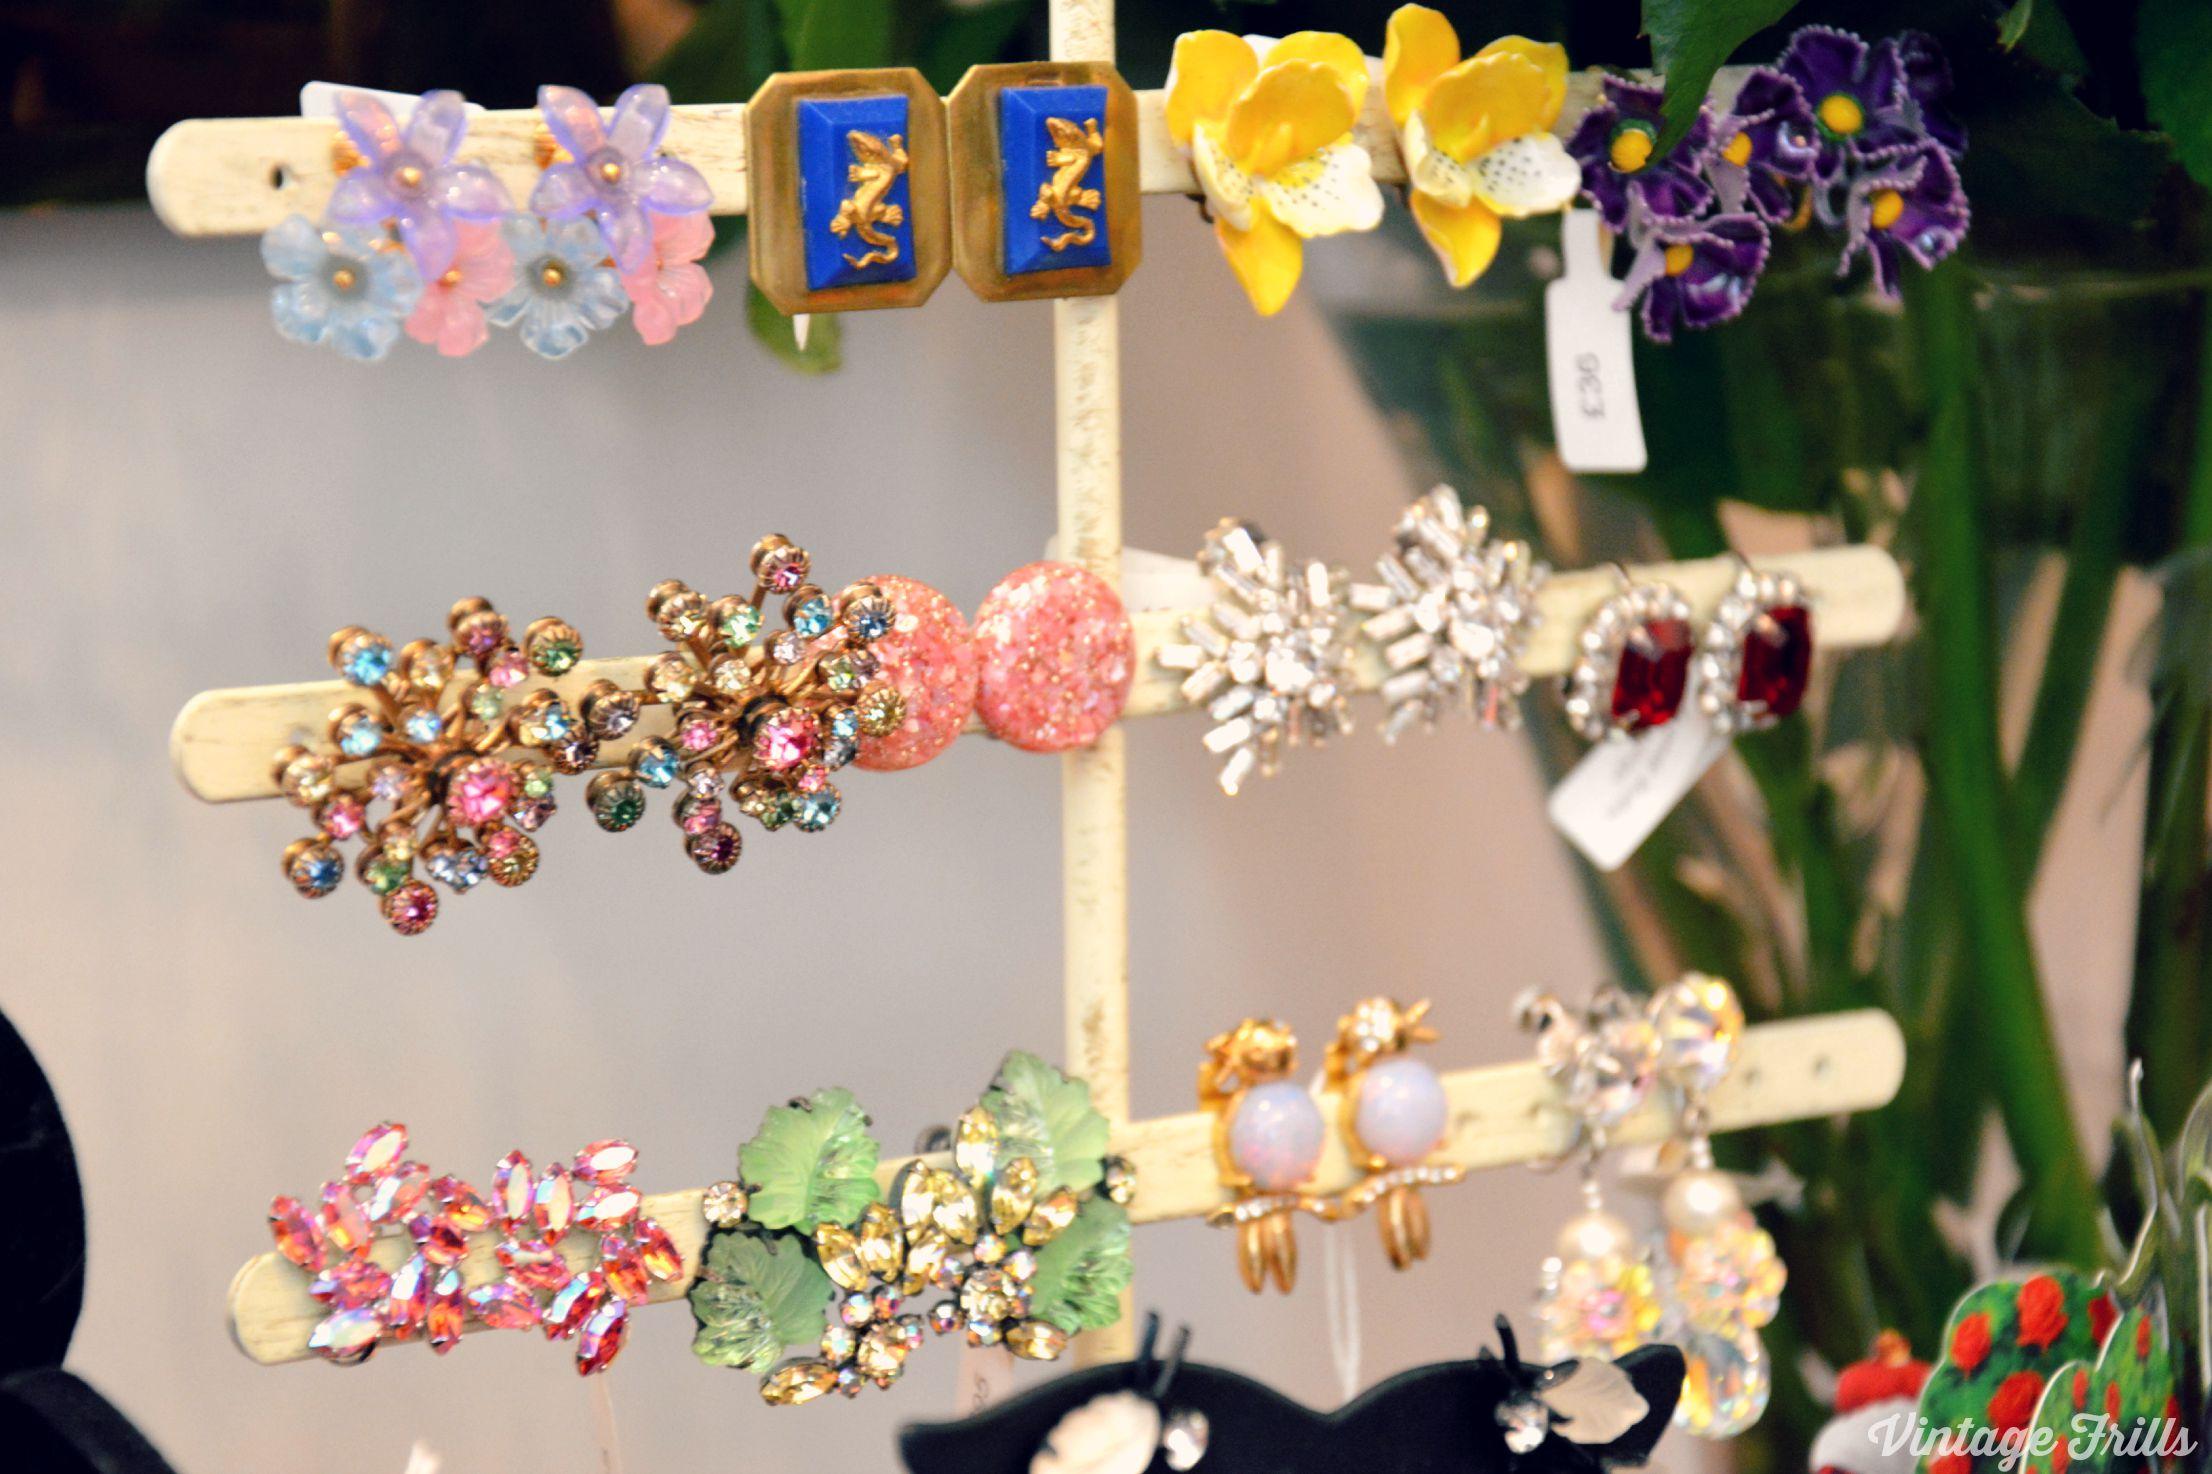 stunning vintage jewellery at passionate about vintage vintage vintage earrings passionate about vintage vintage frills